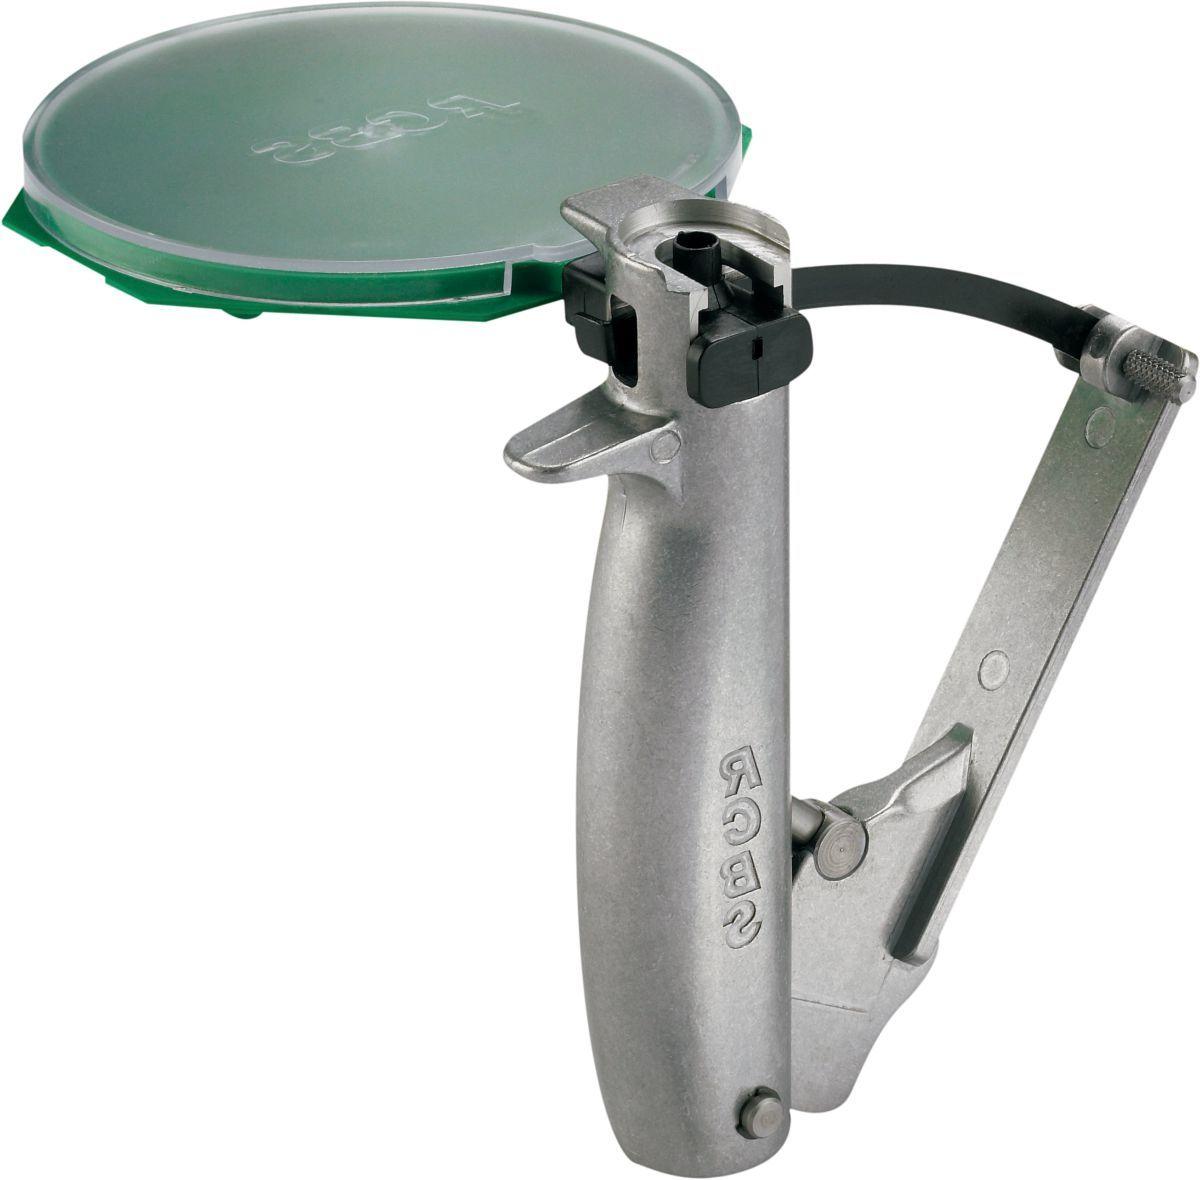 RCBS® Hand Priming Tool